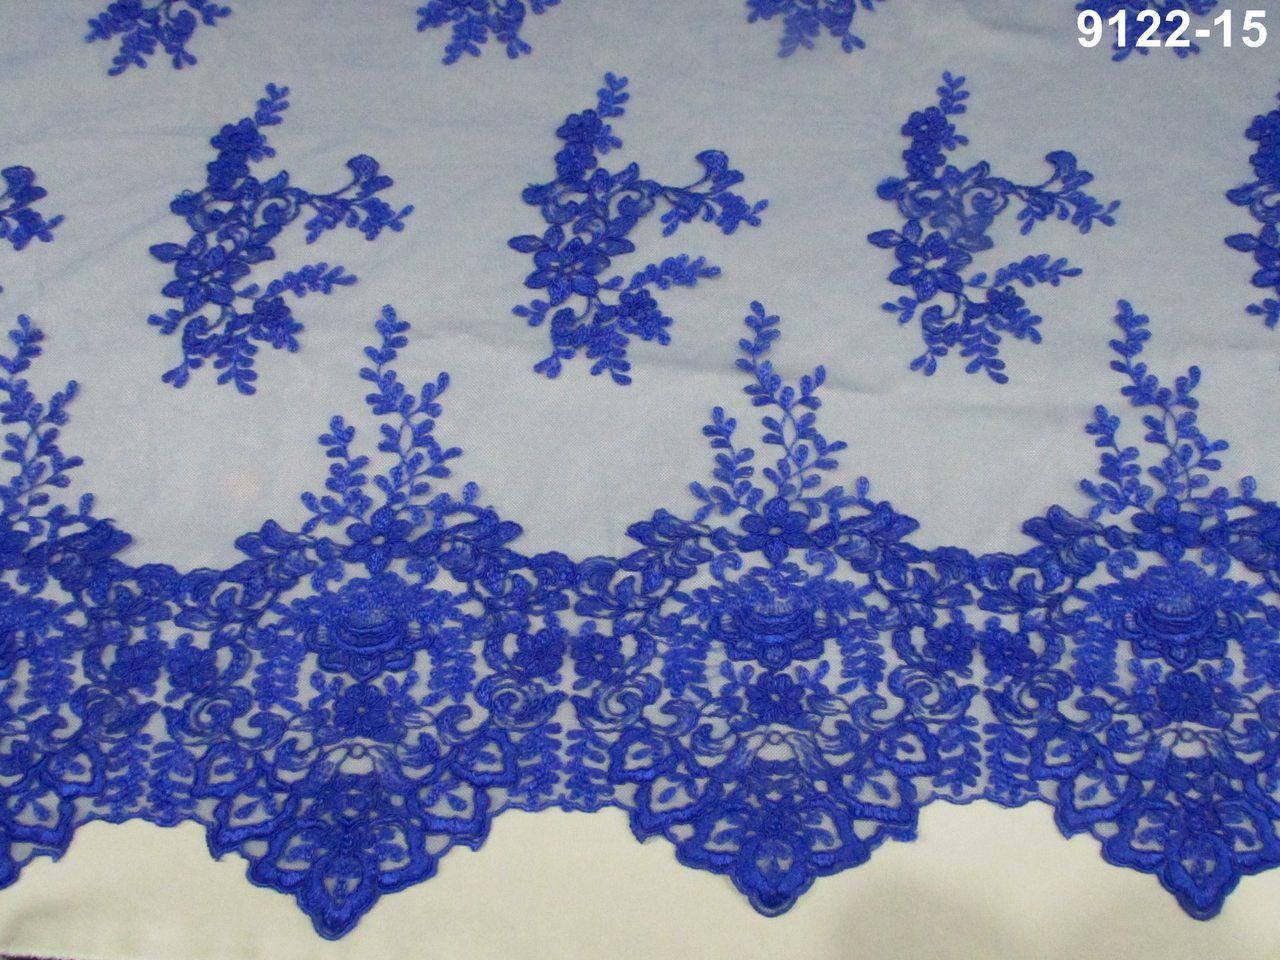 Tecido Renda Floral Royal